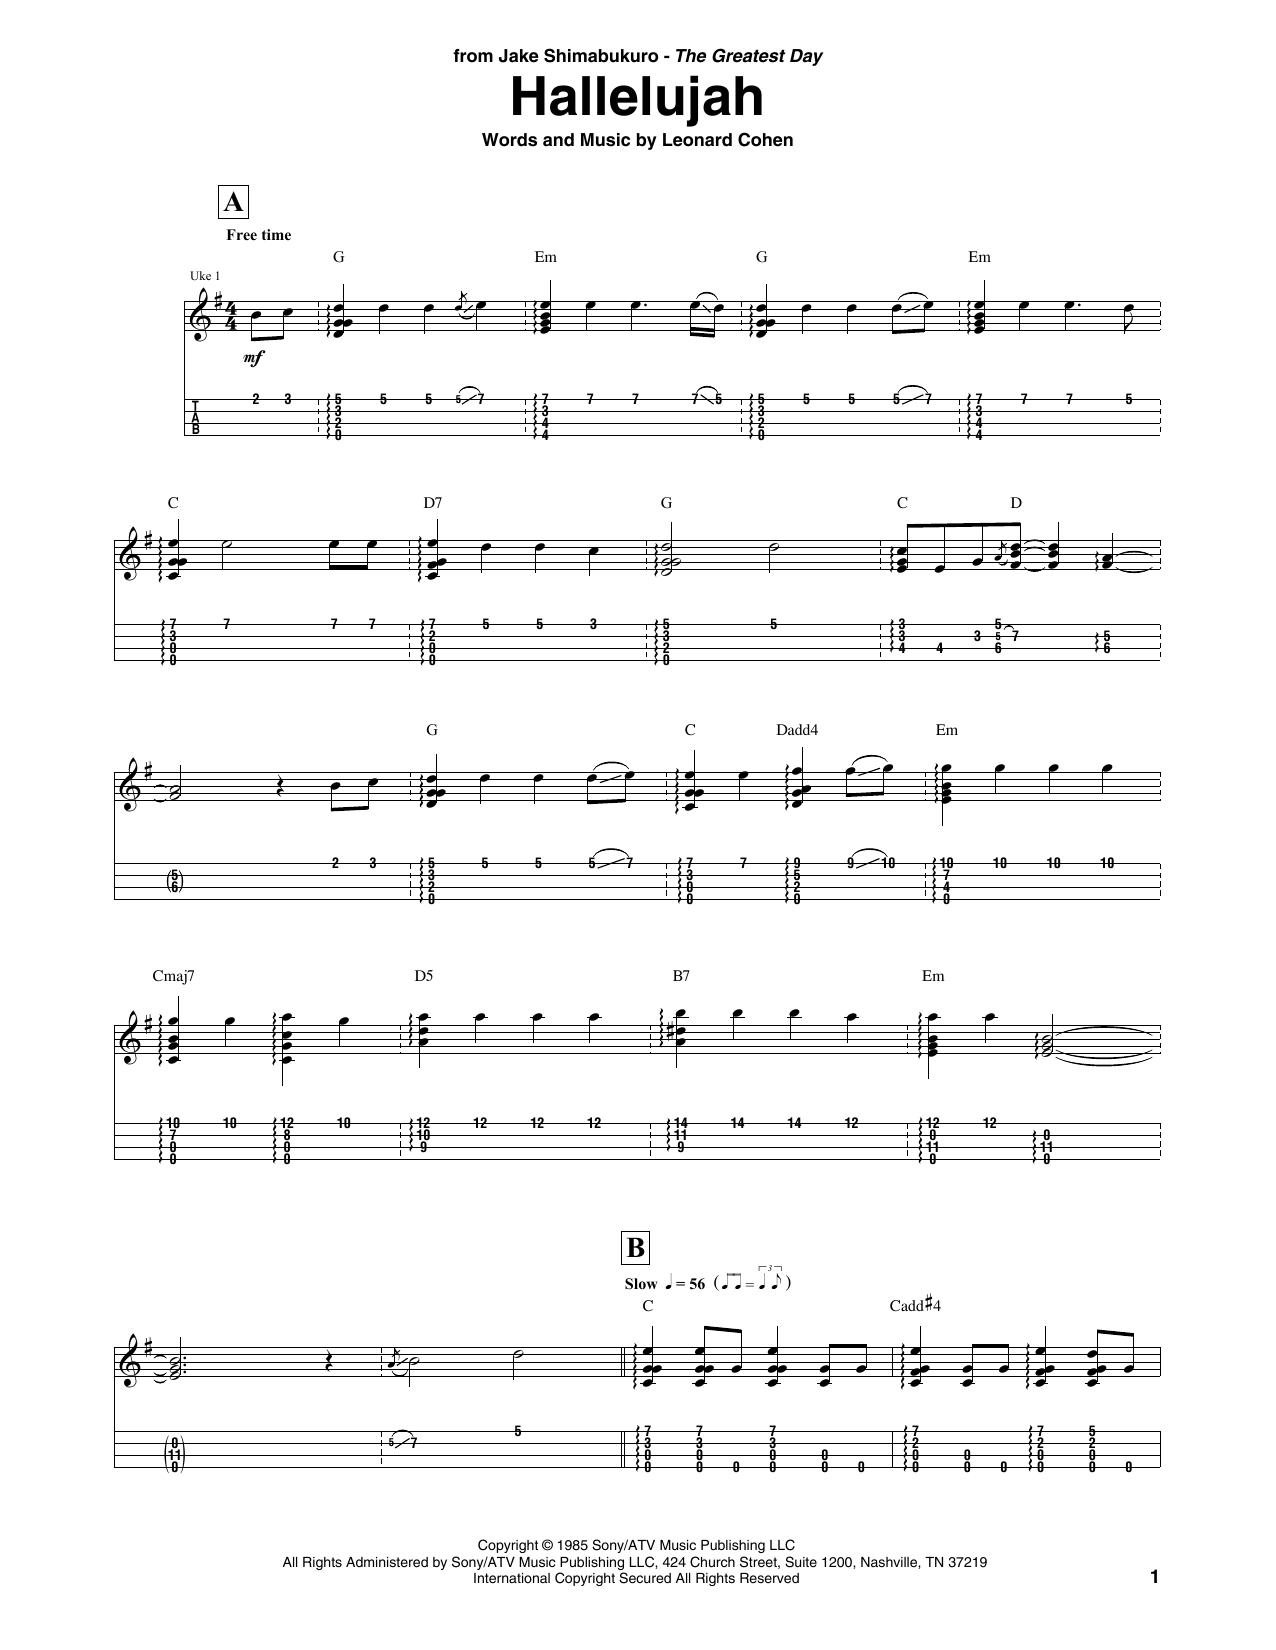 Hallelujah Ukulele Chords Hallelujah Arr Jake Shimabukuro Leonard Cohen Ukulele Tab